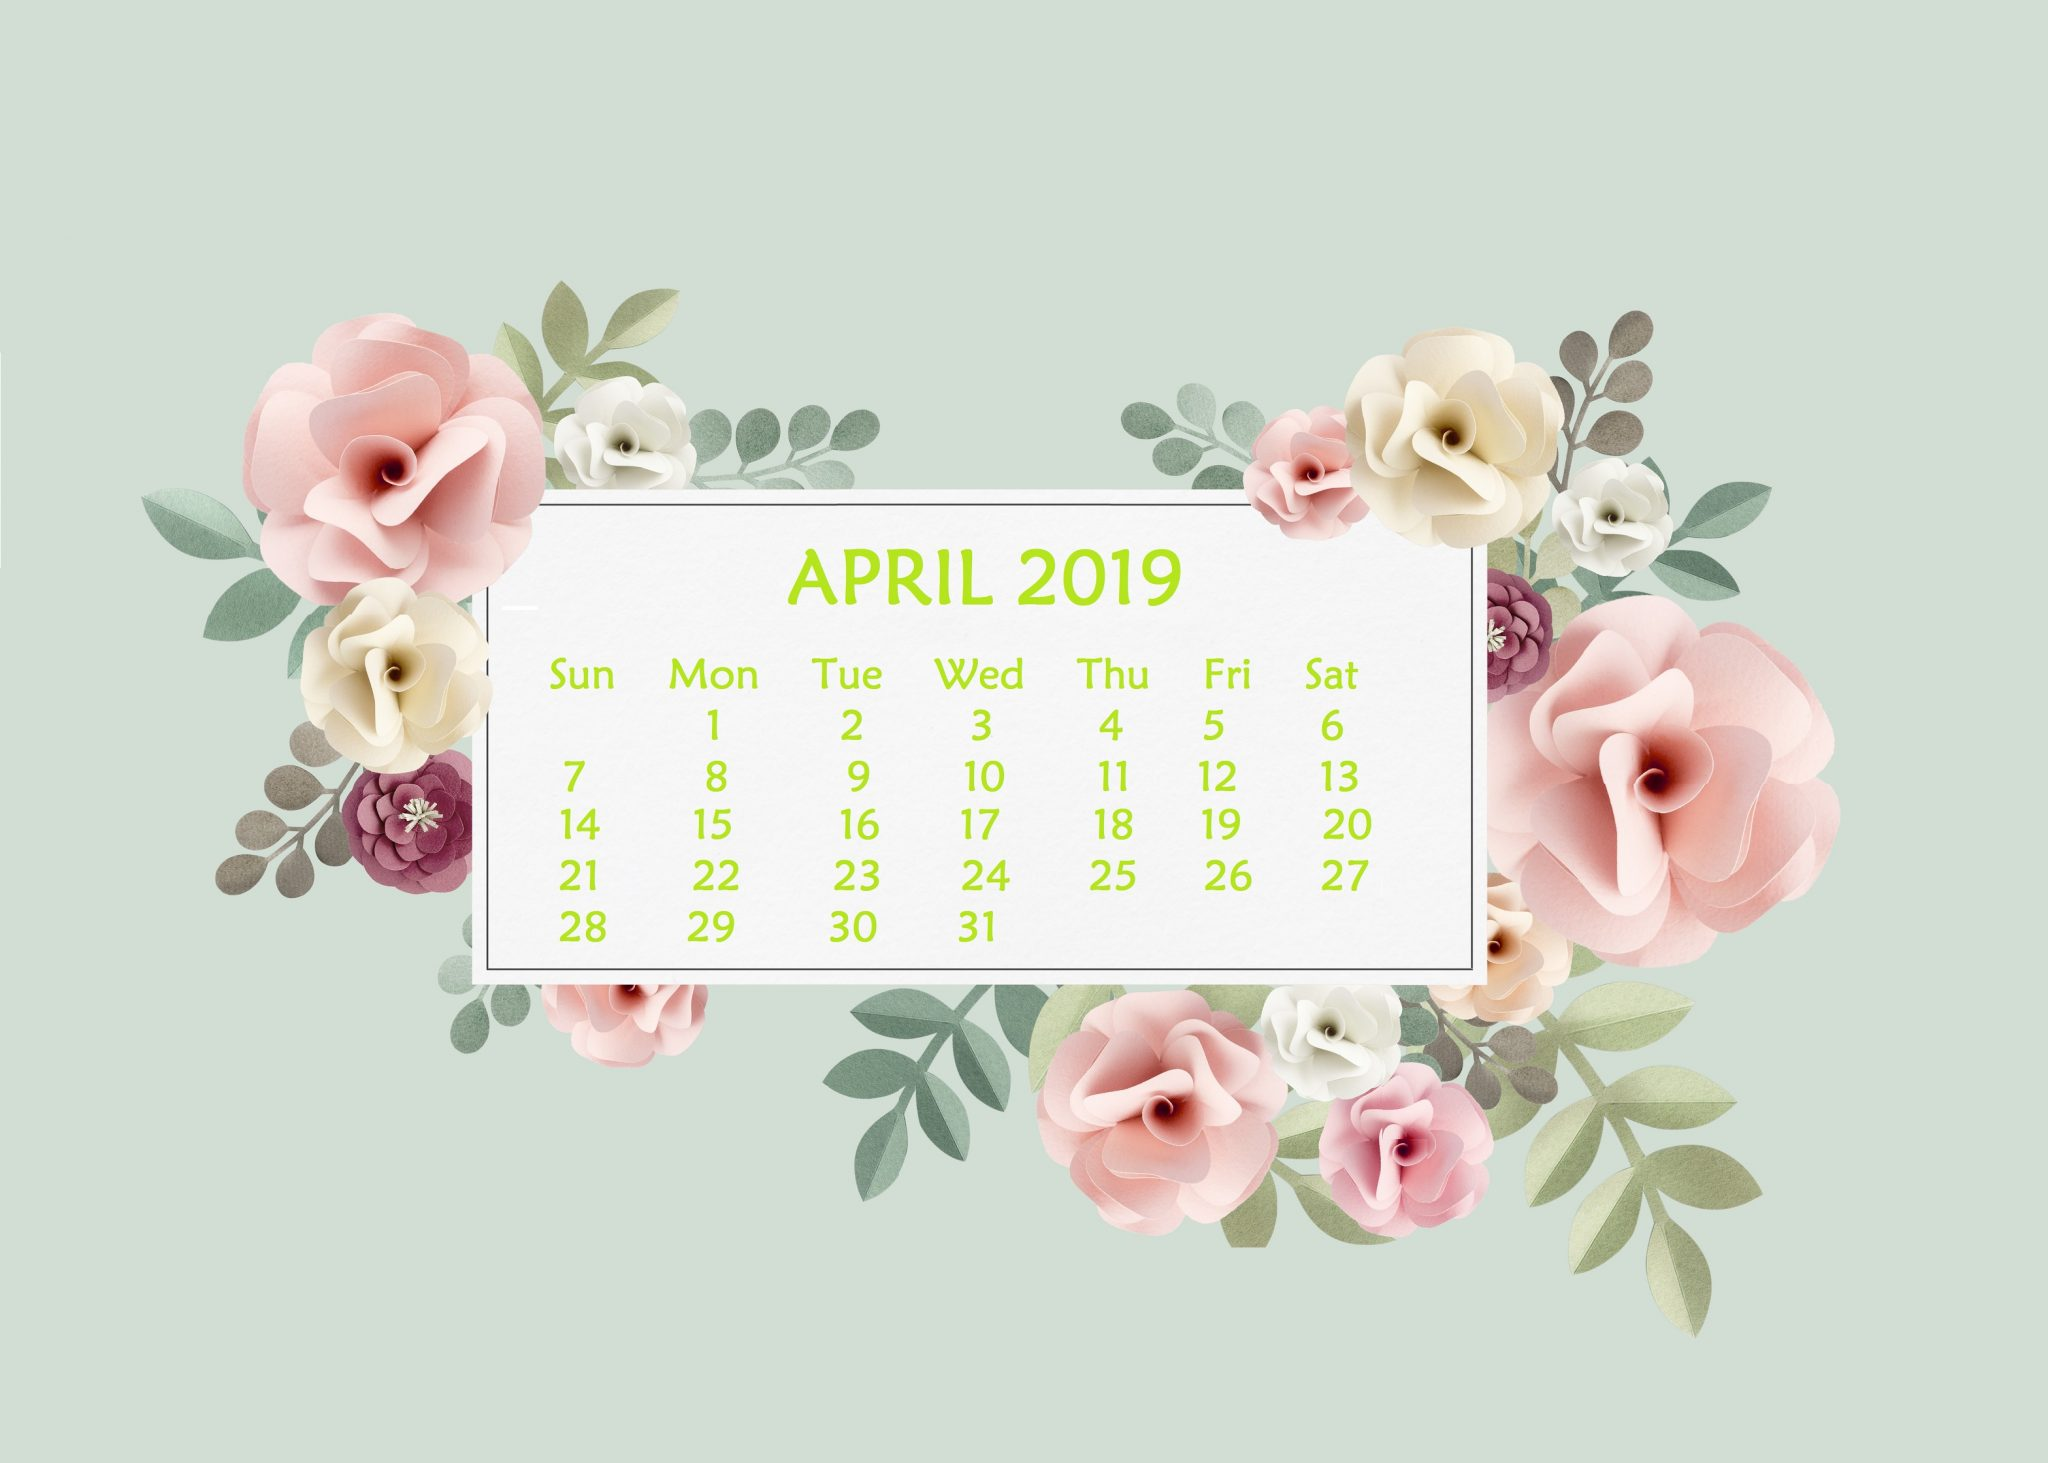 April 2019 Desktop Wallpaper With Calendar - April 2019 Calendar Computer Background , HD Wallpaper & Backgrounds